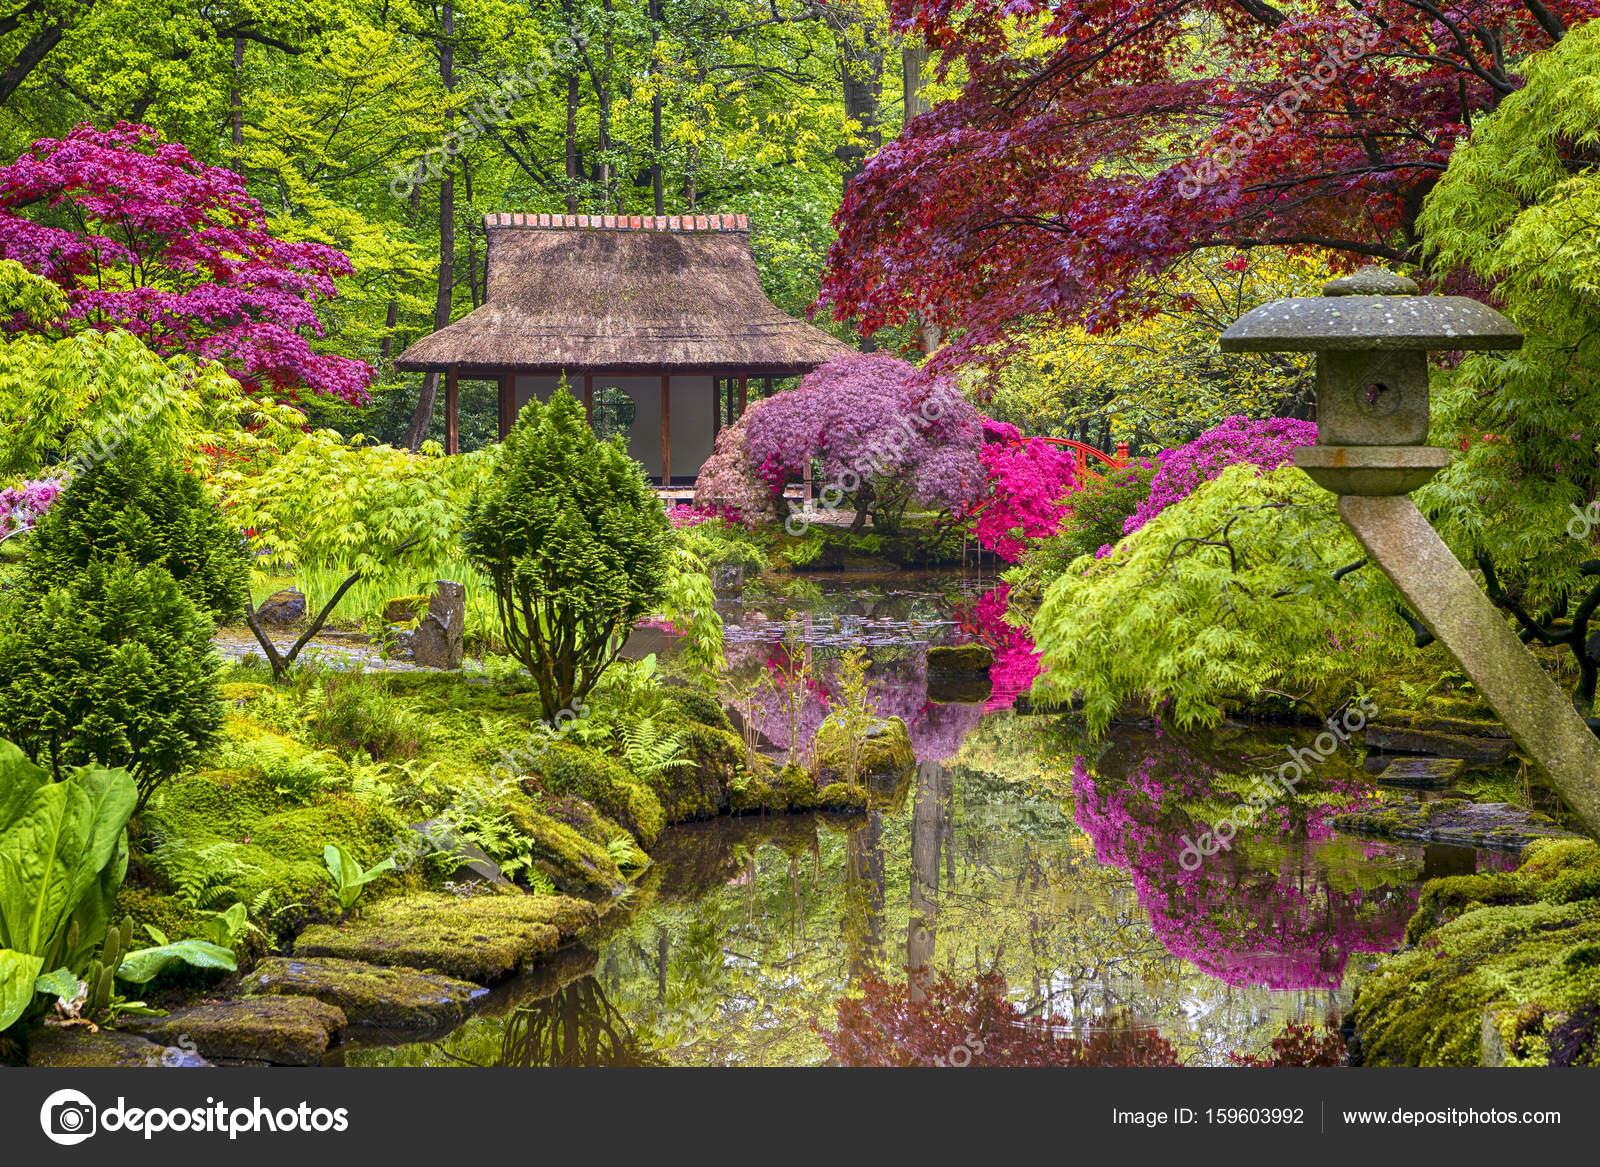 paysage jardin japonais top tableau jardin japonais en ce qui concerne couvre sol jardin. Black Bedroom Furniture Sets. Home Design Ideas